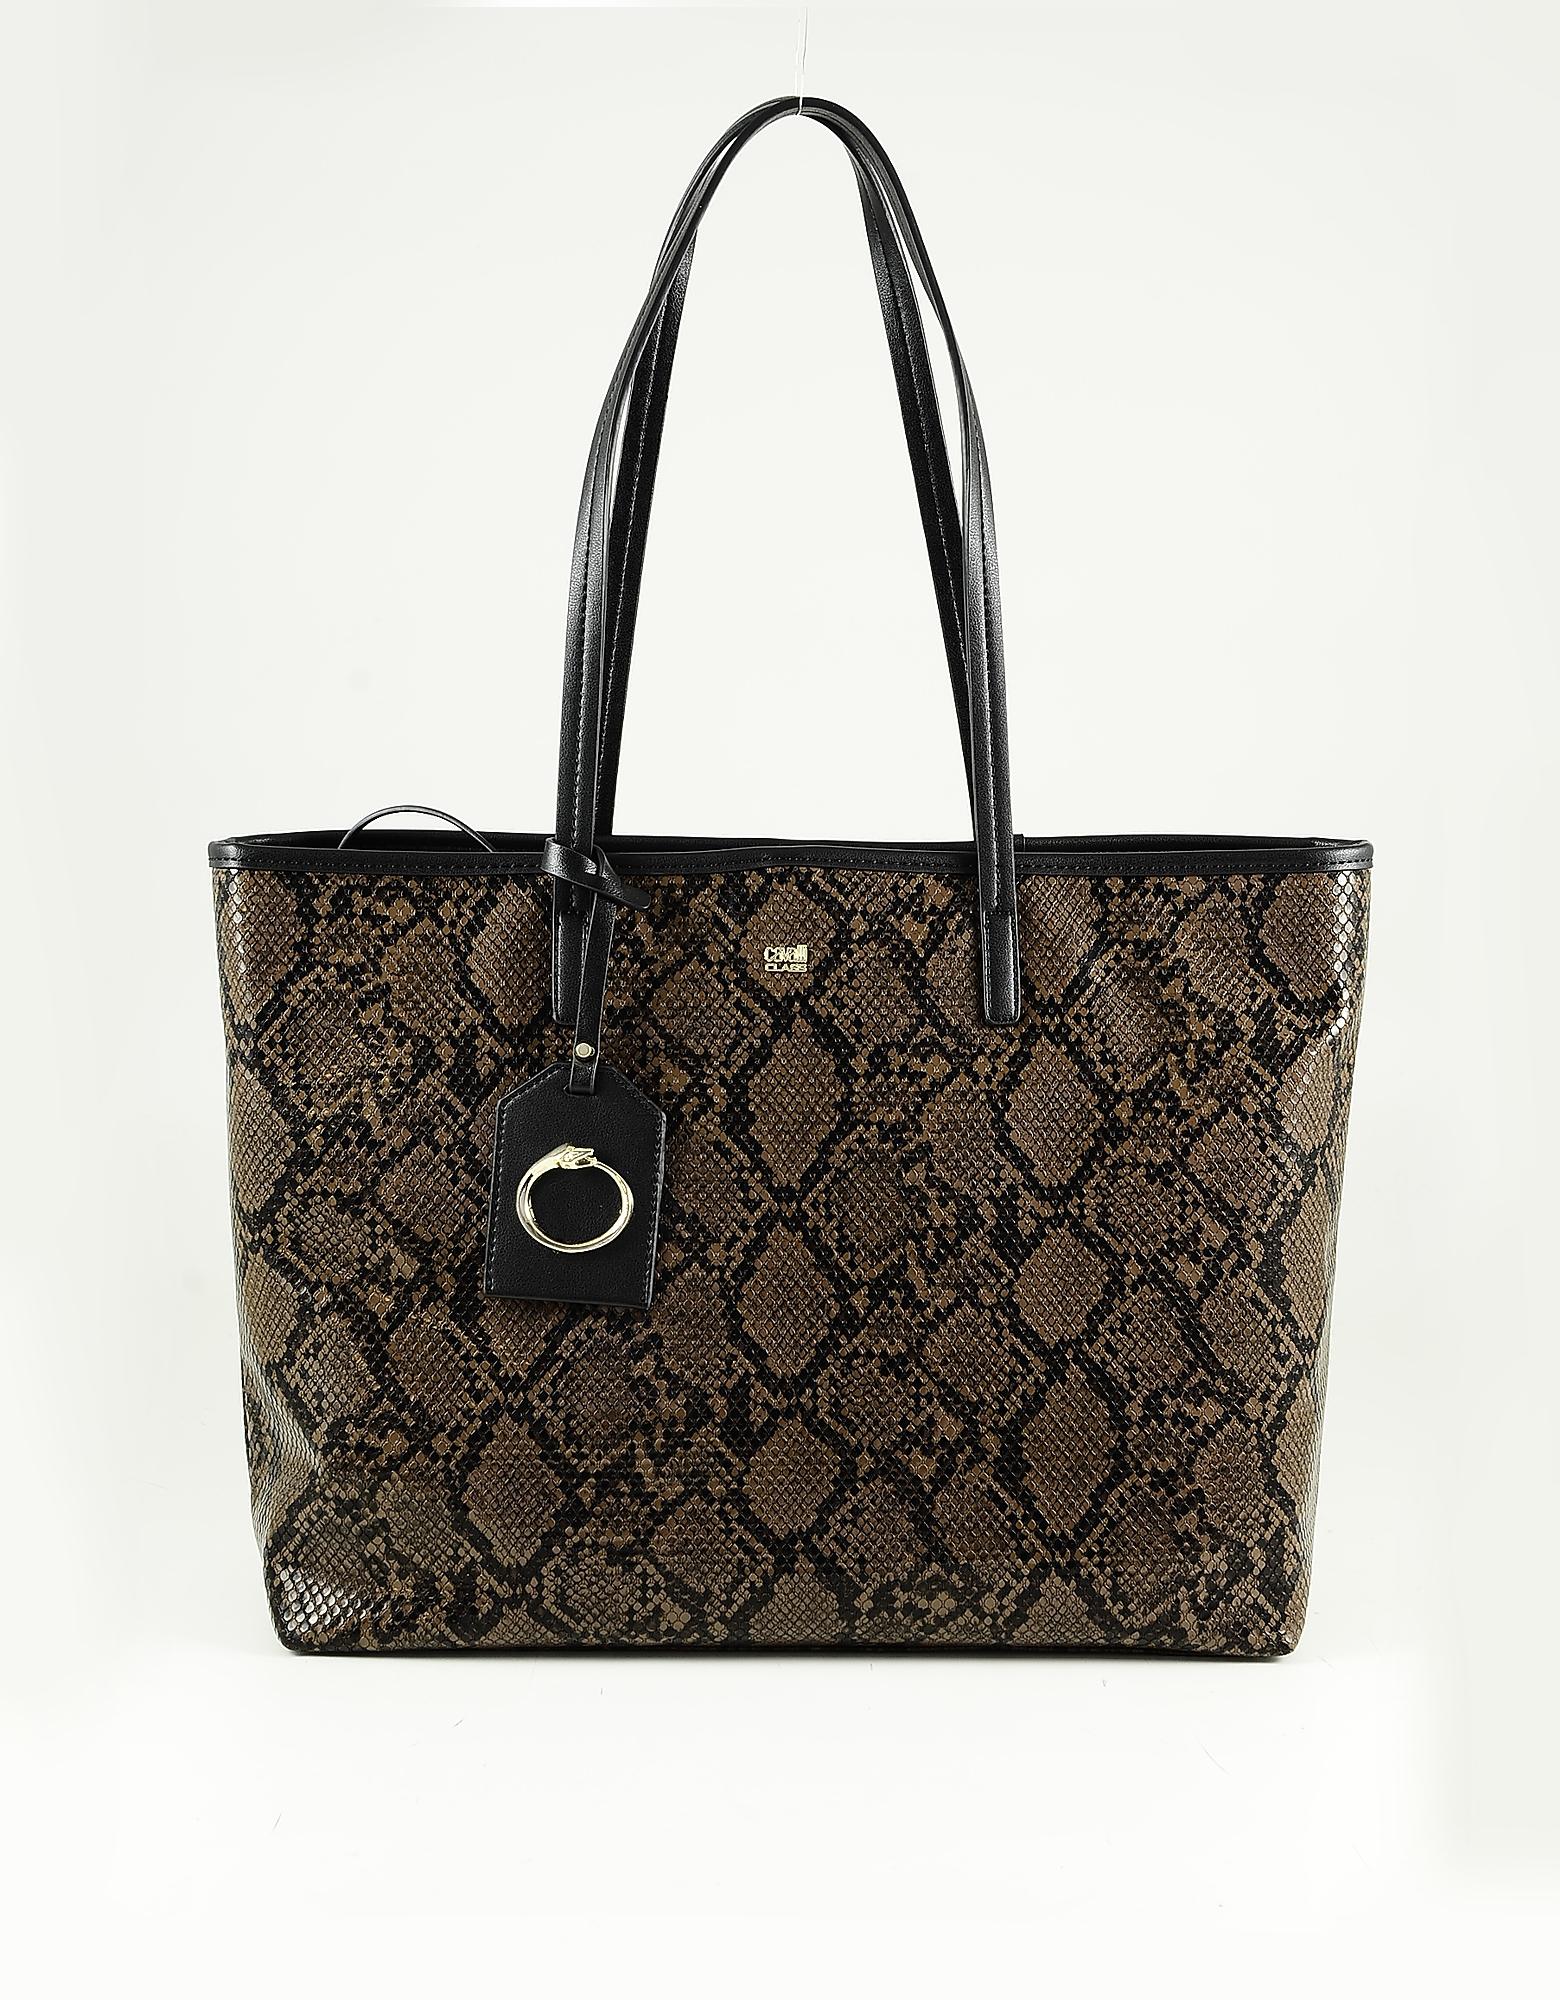 Class Roberto Cavalli Brown & Black Animal Print Eco Leather Tote Bag